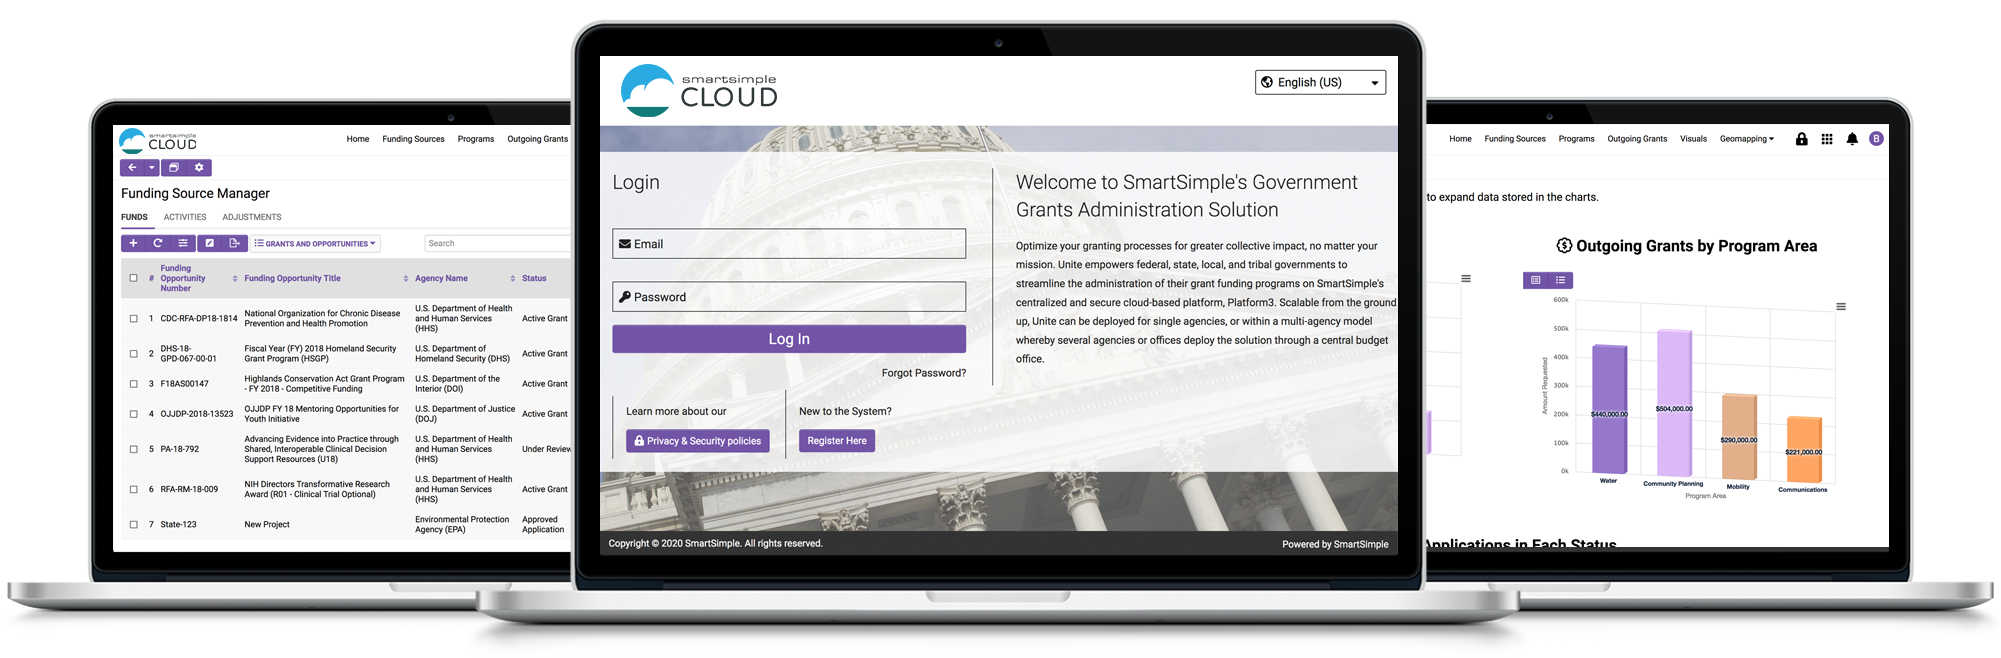 Three SmartSimple Cloud screenshots